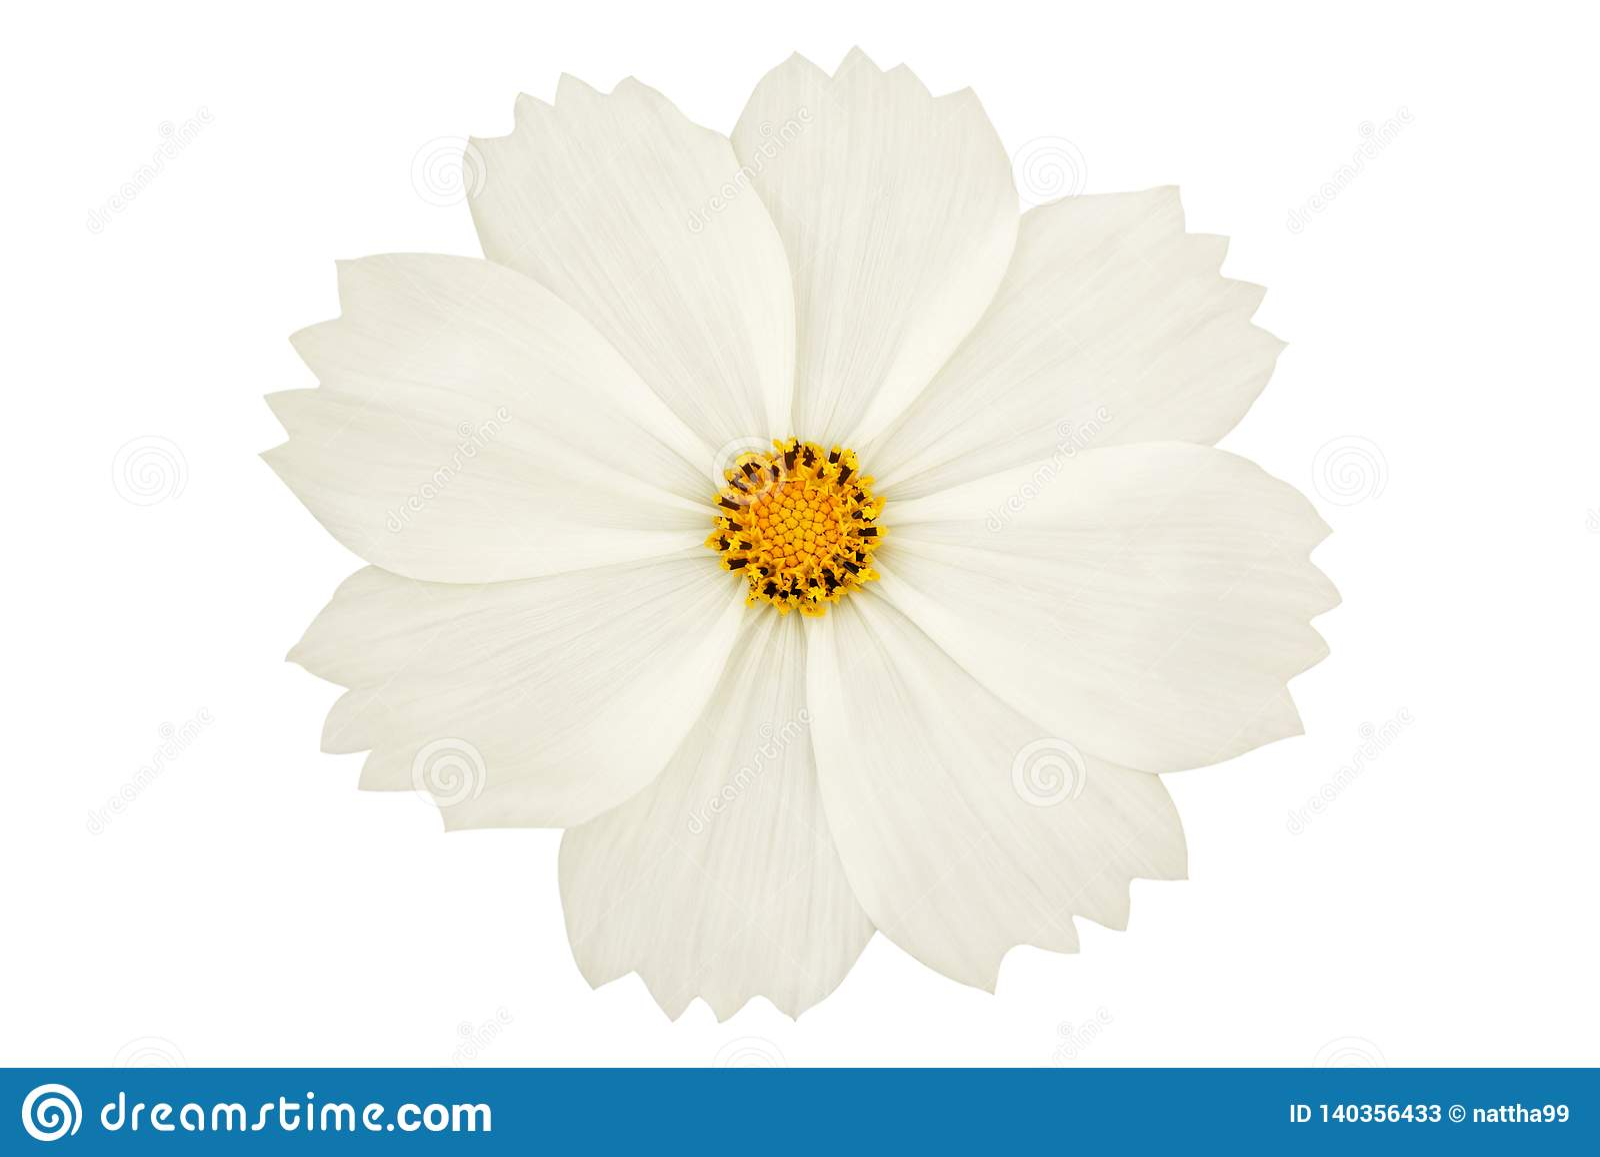 Beautiful white cosmos flower isolated on white background